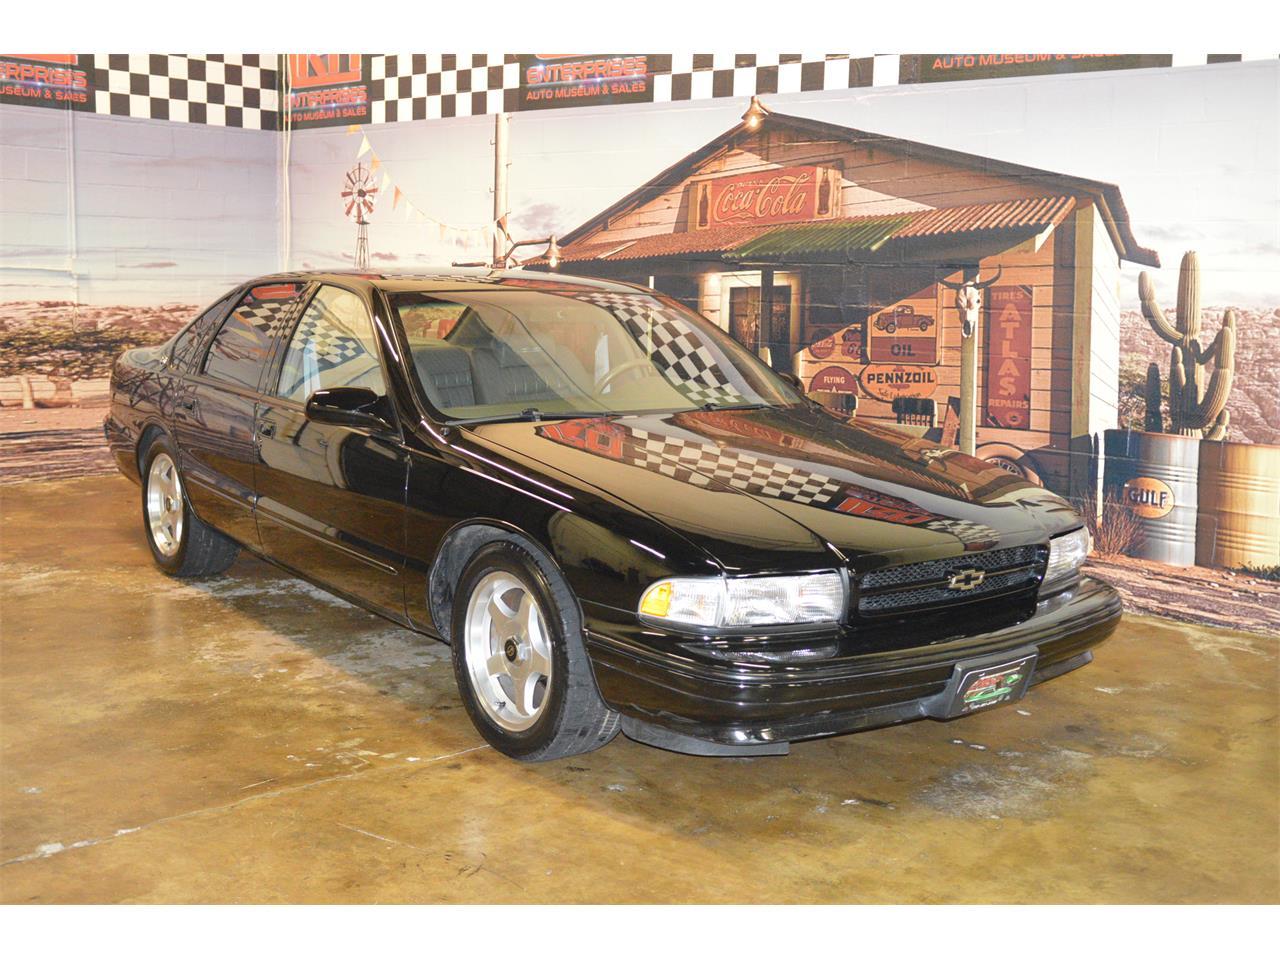 For Sale: 1996 Chevrolet Impala SS in bristol, Pennsylvania